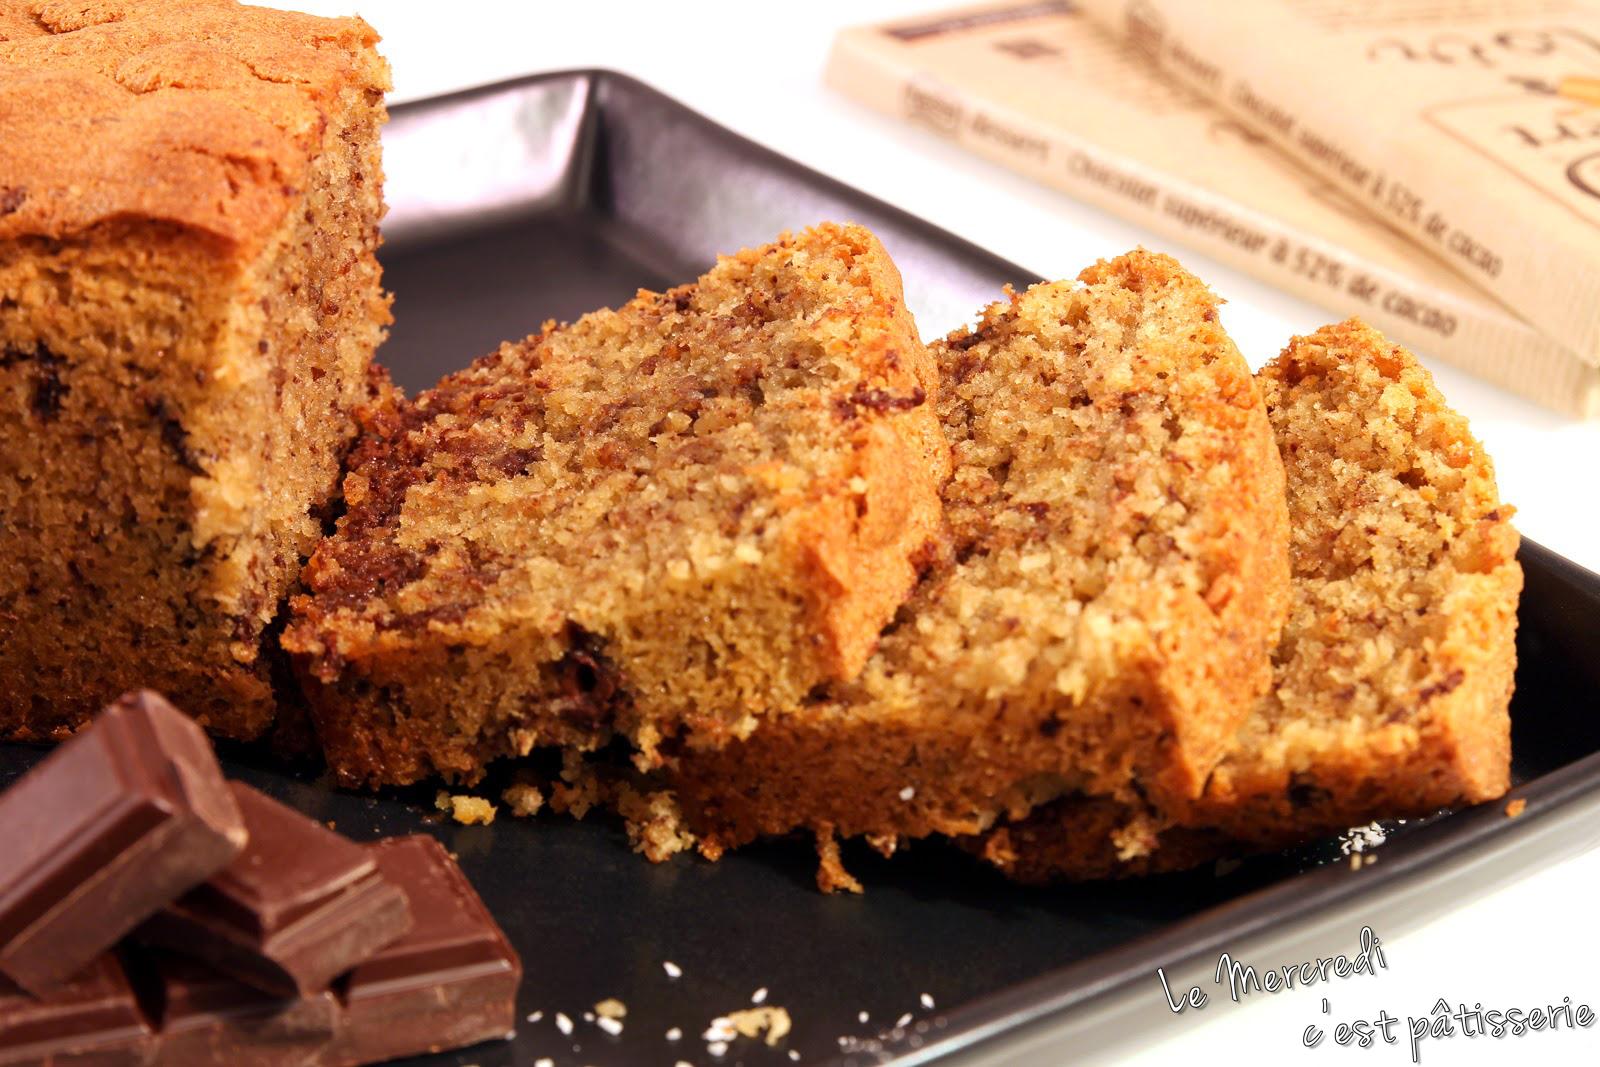 Cake noix de coco - chocolat